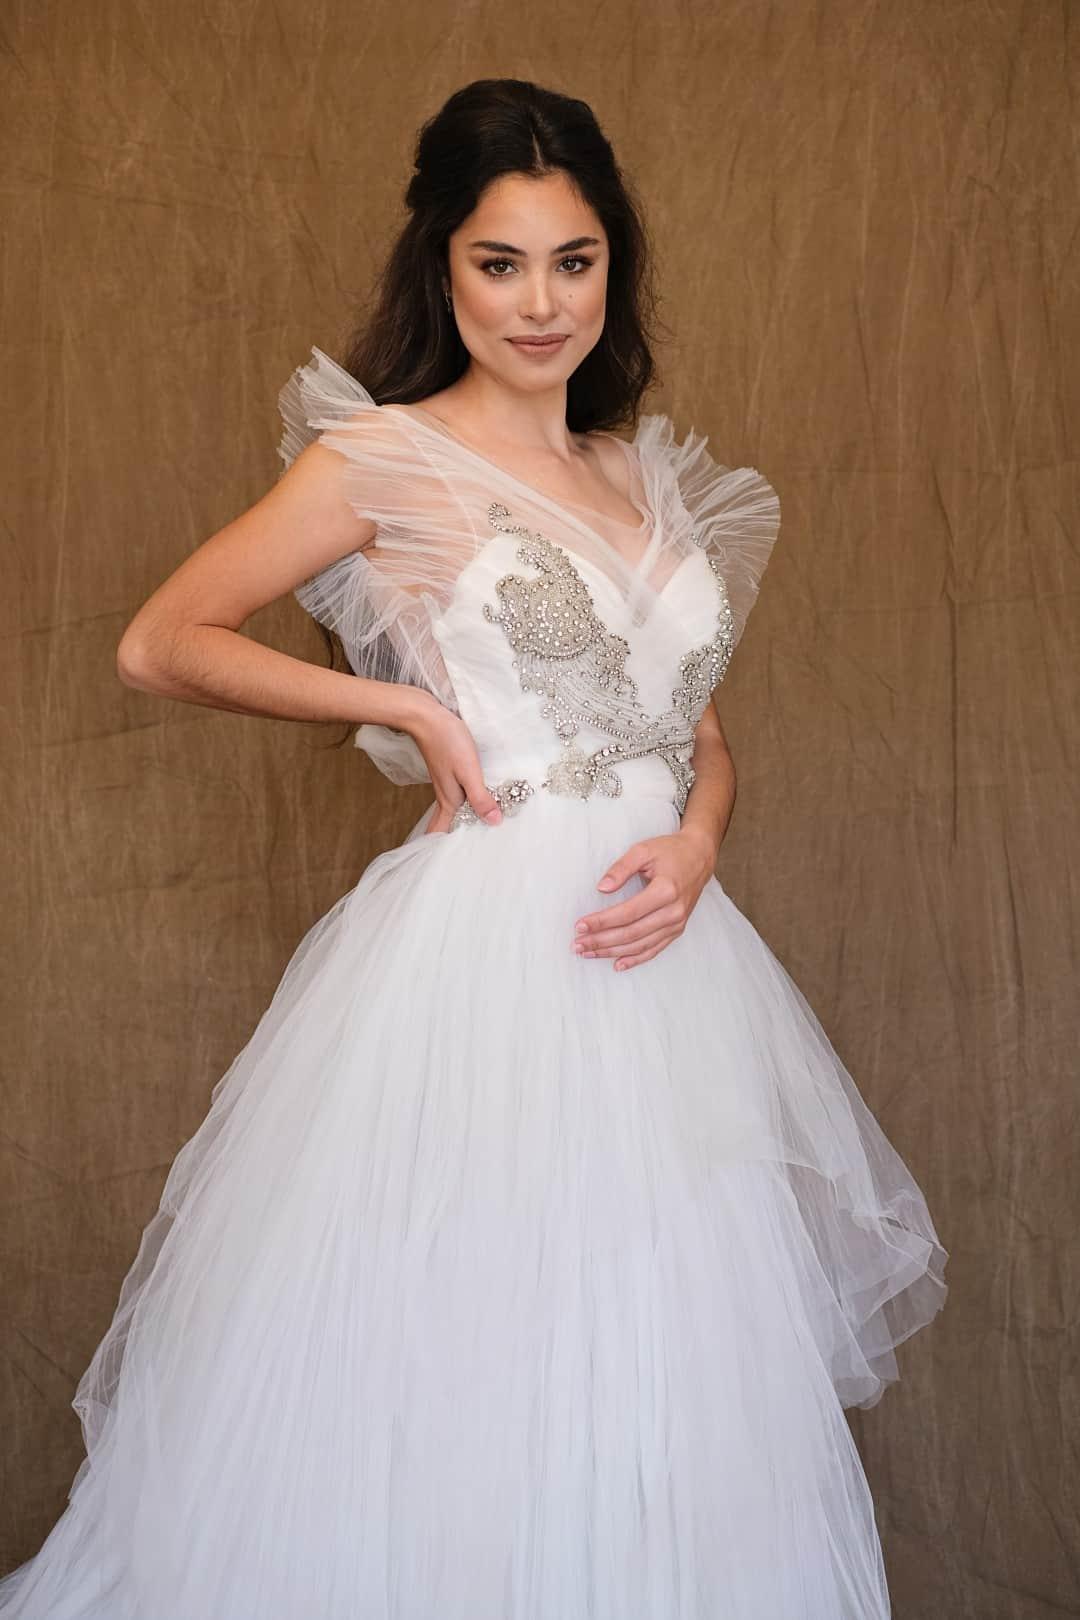 Jemné a romantické svadobné šaty - Marco&Maria - 14-1031-front-top